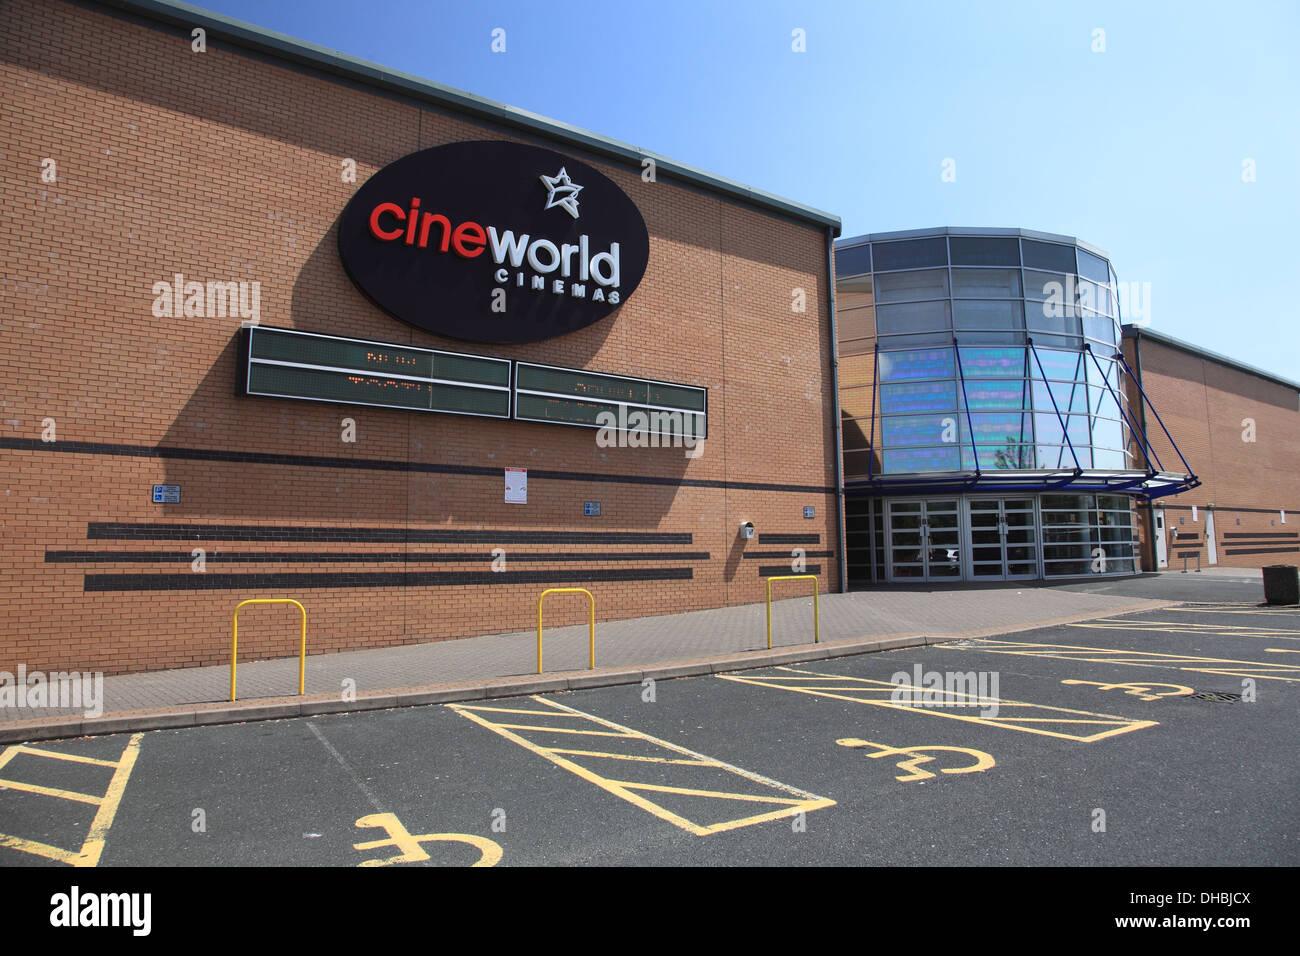 Cineworld cinema in Shrewsbury - Stock Image